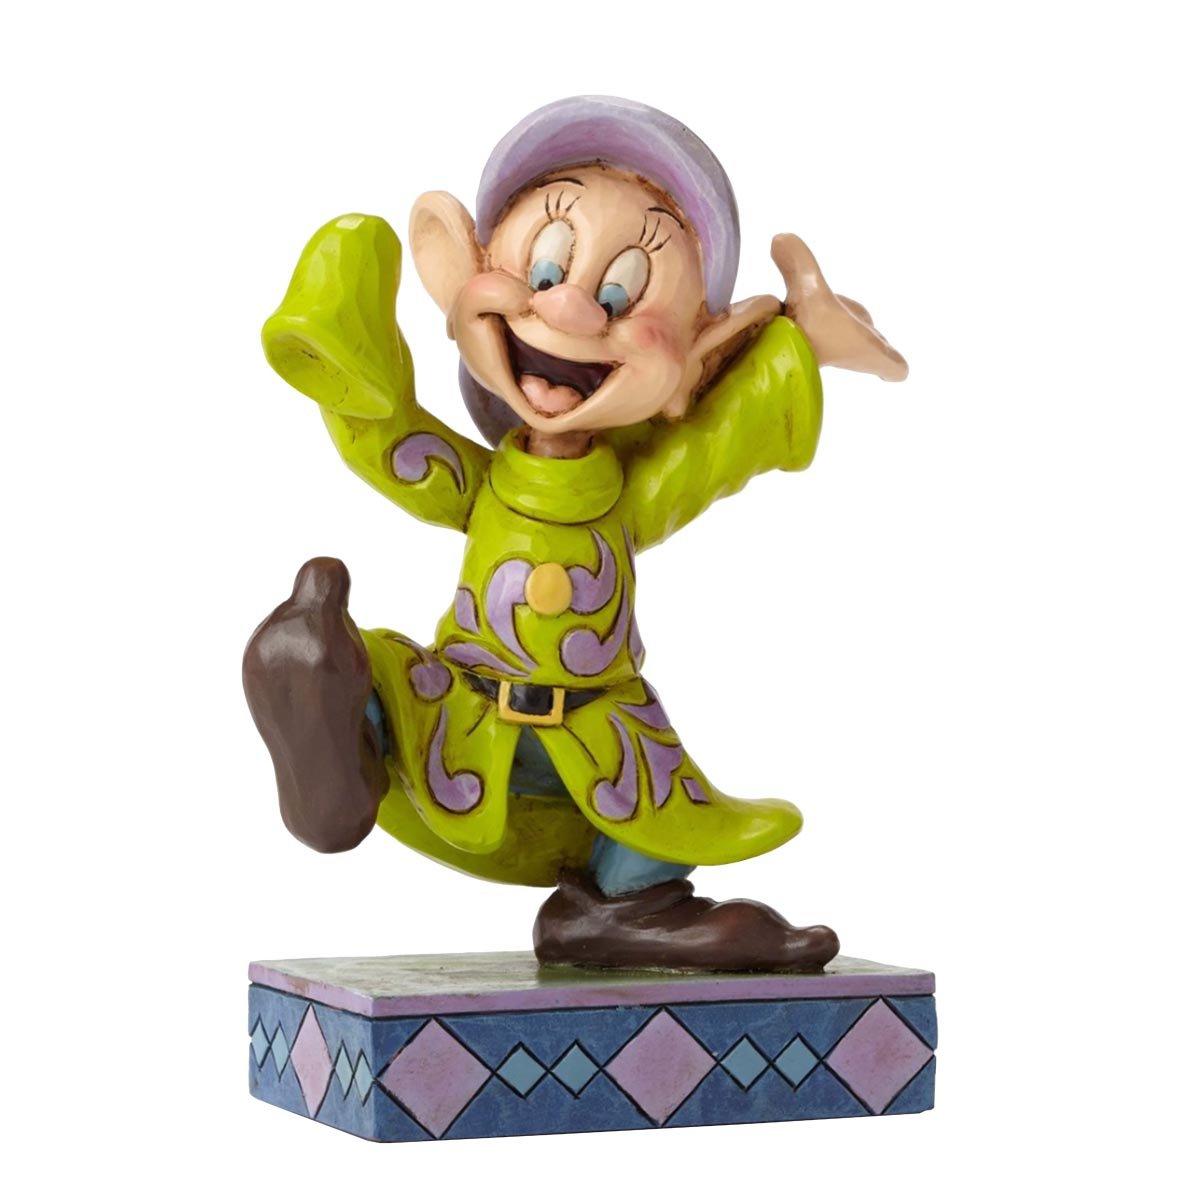 Enesco 4049624 Disney Traditions Dopey Figurine